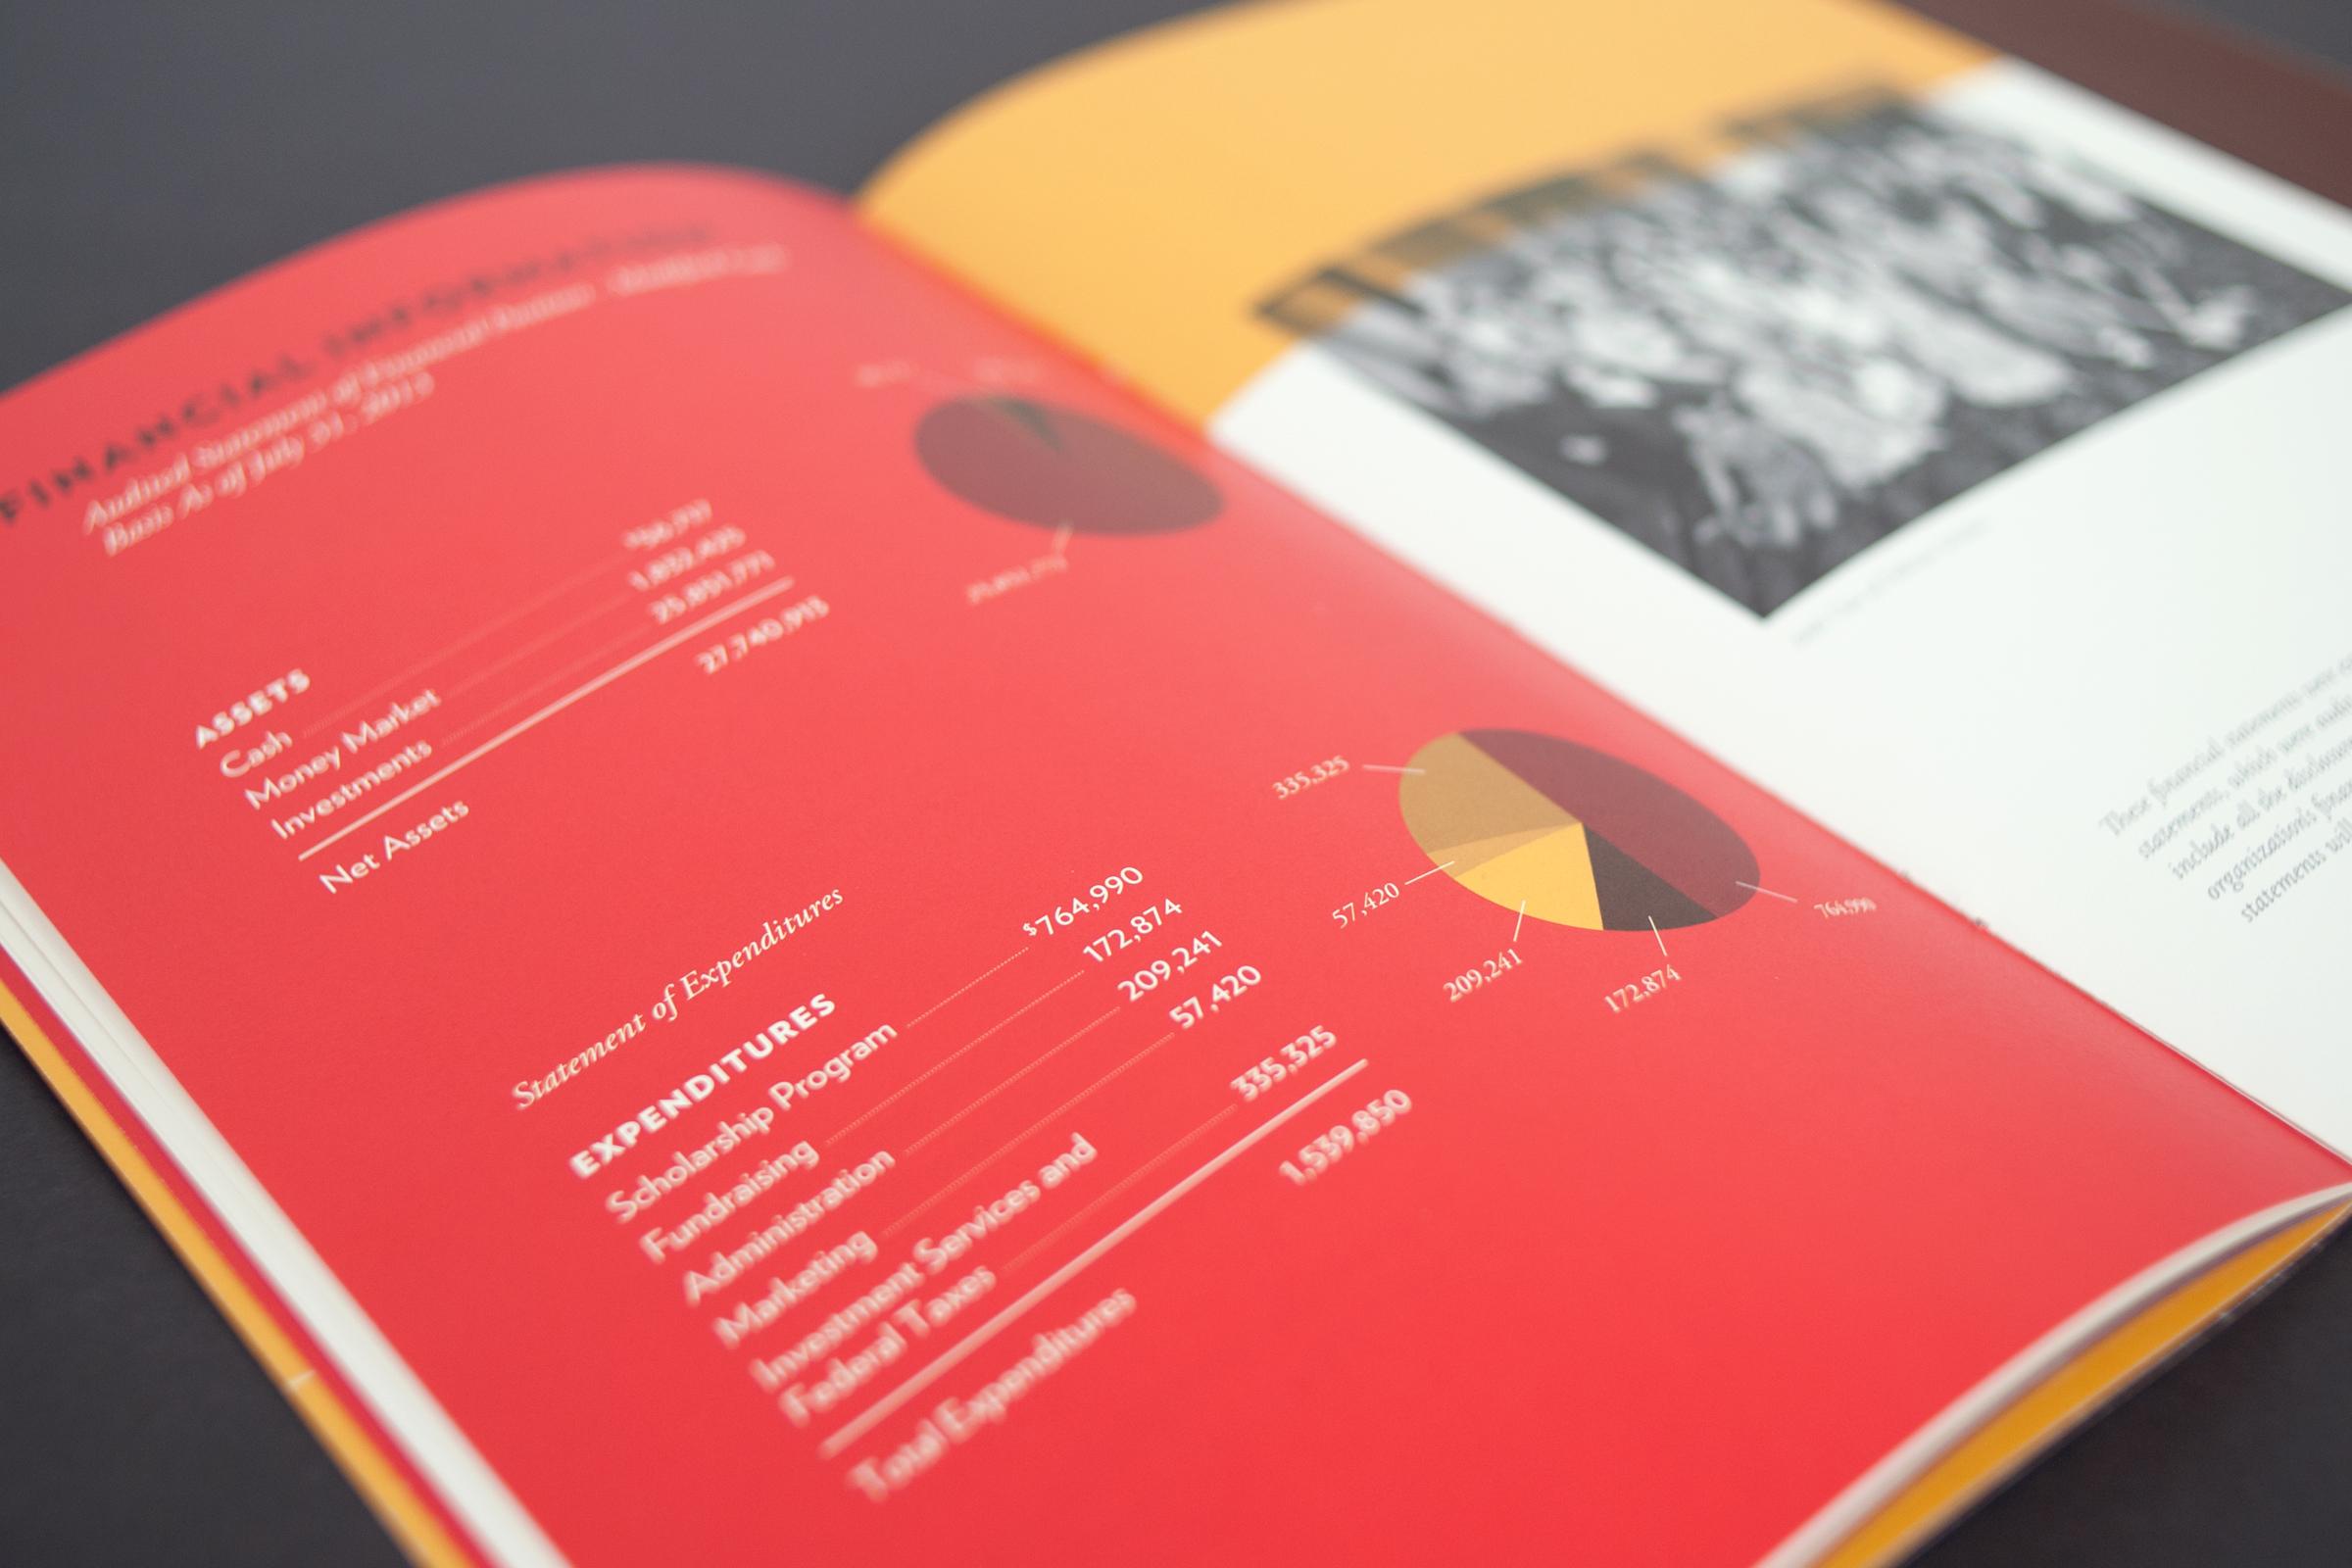 2013 Pullman Foundation Annual Report